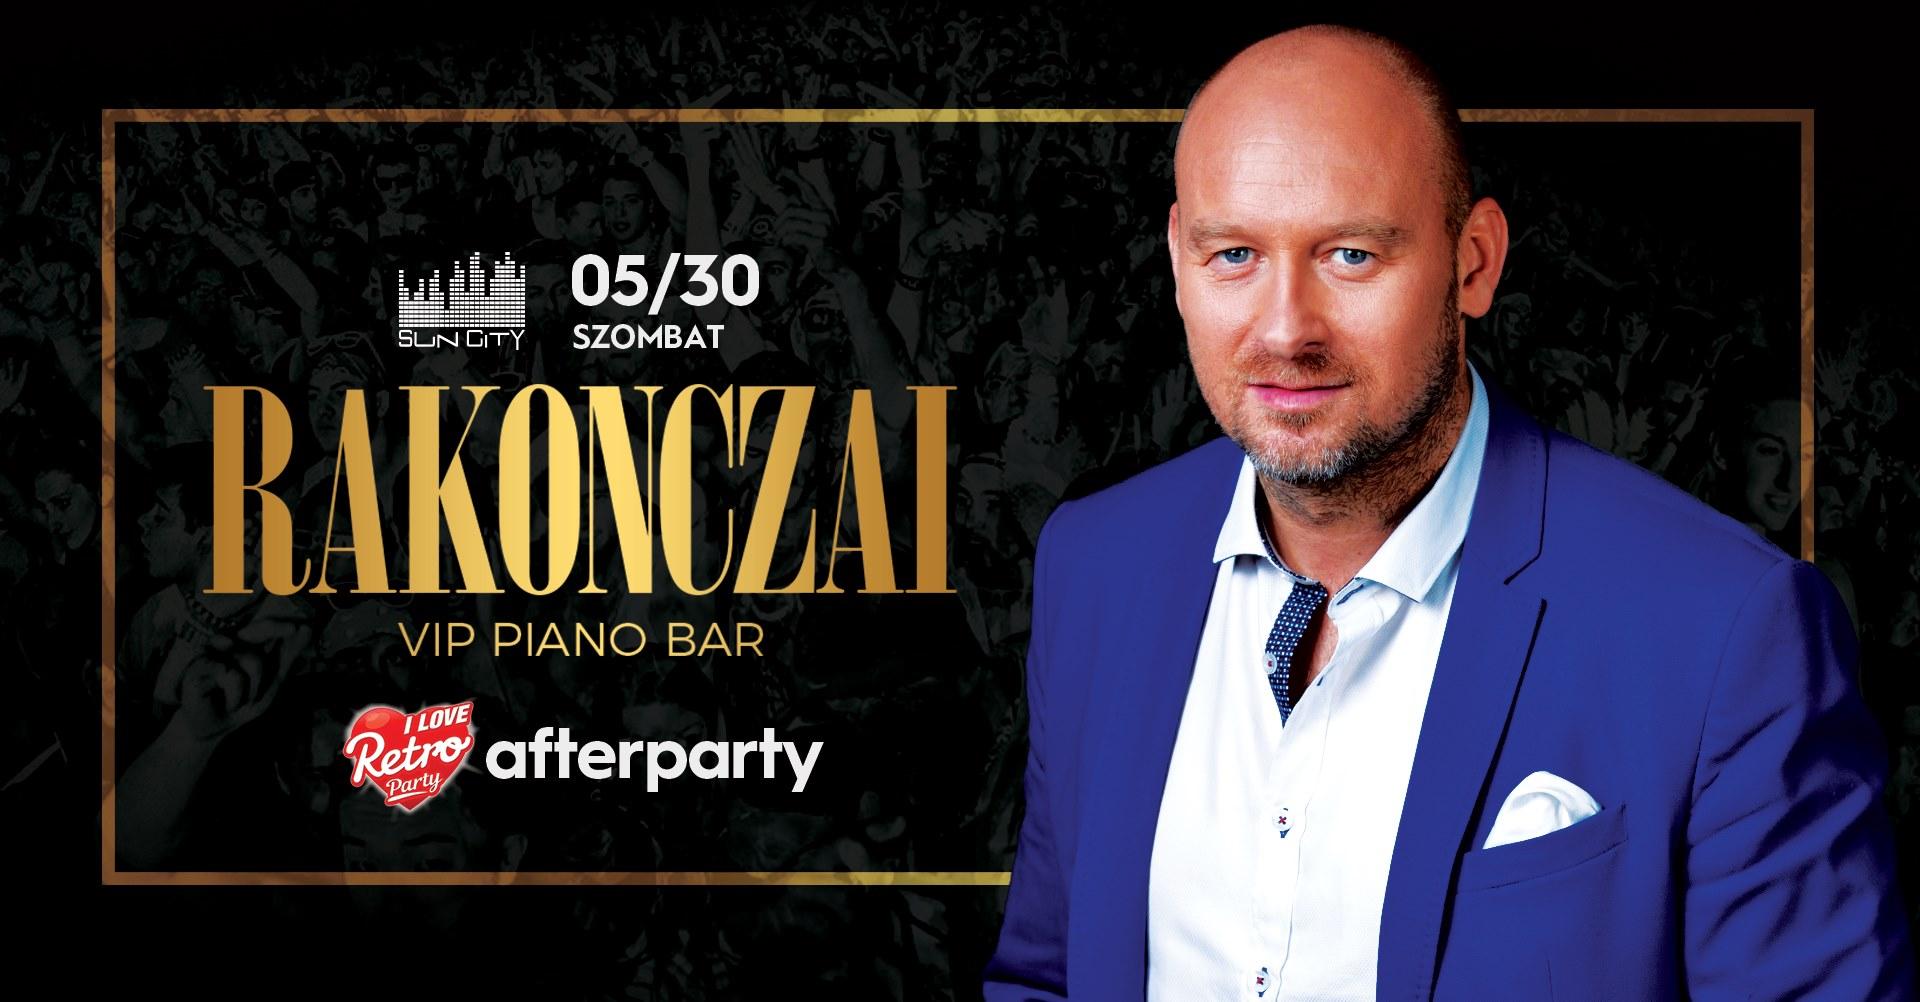 Rakonczai VIP Piano Bar • 05.30. • SunCity Balatonfüred